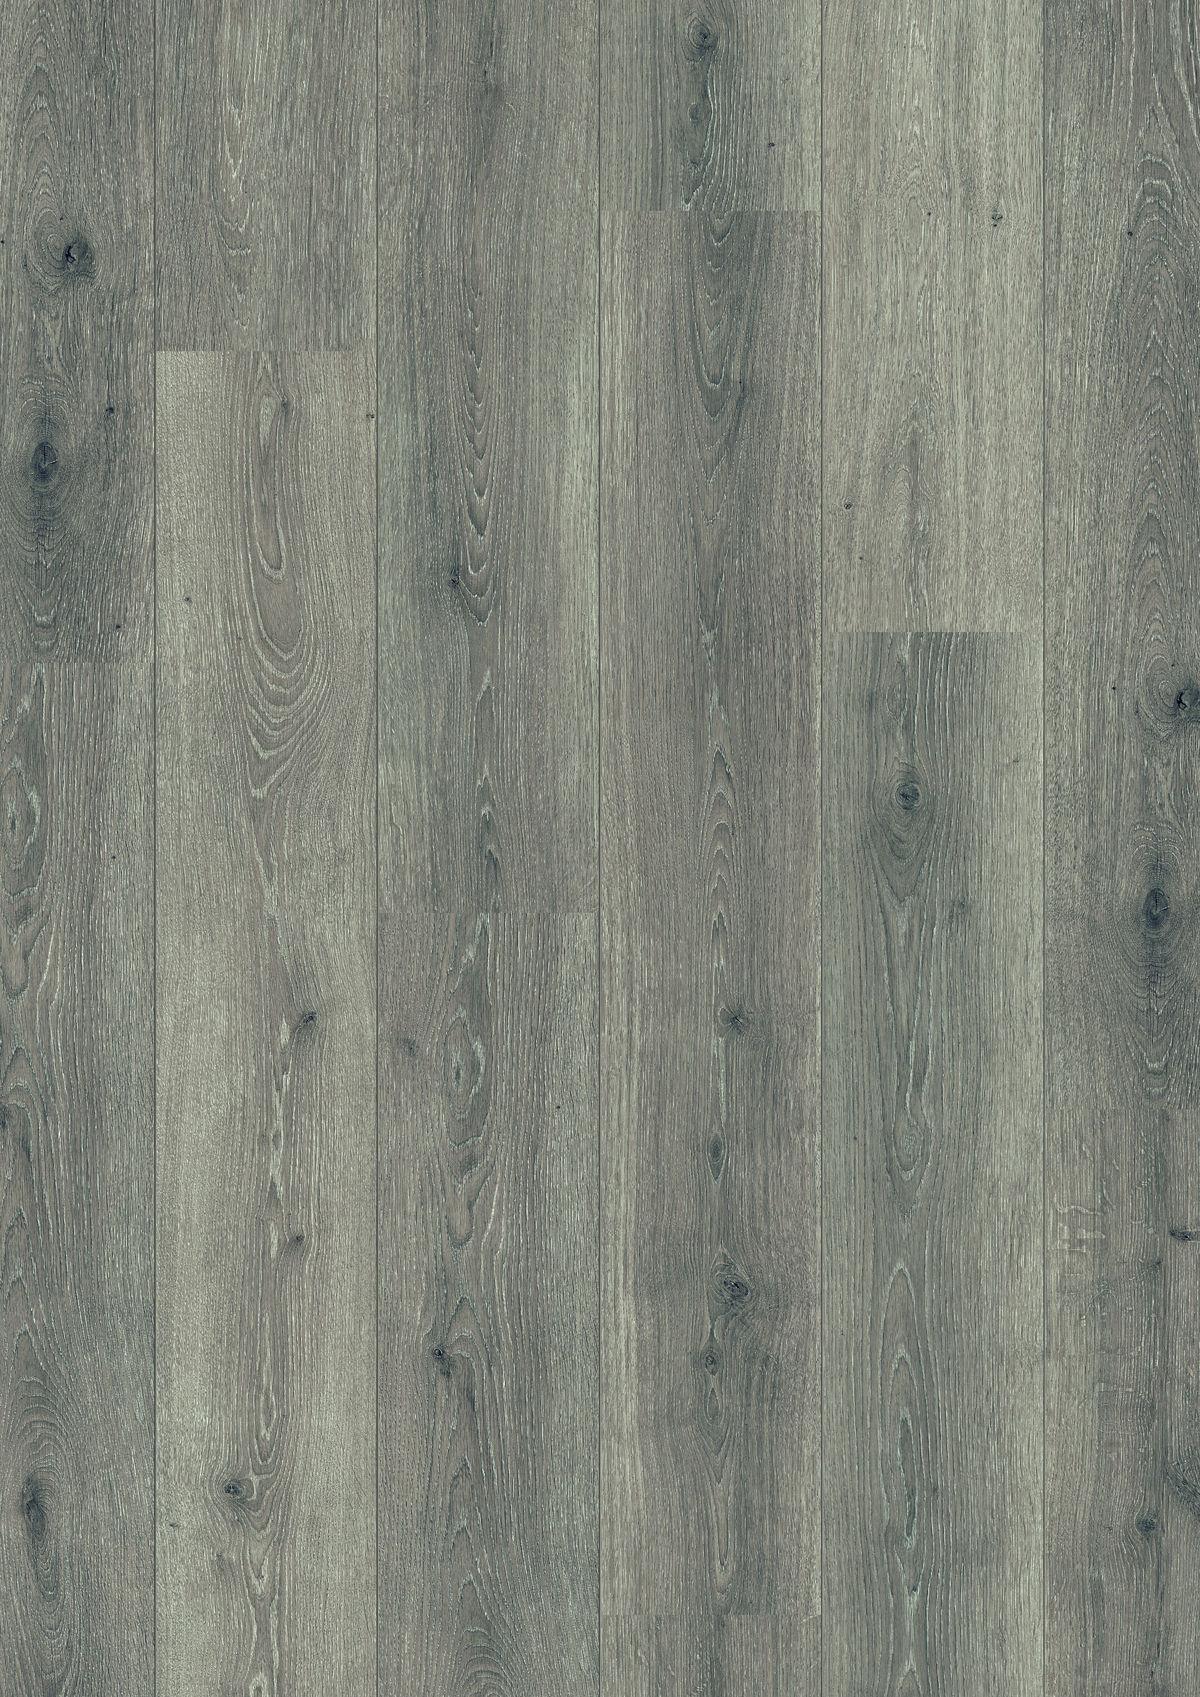 Pergo living expression mountain grey oak laminate flooring for Today s living laminate flooring